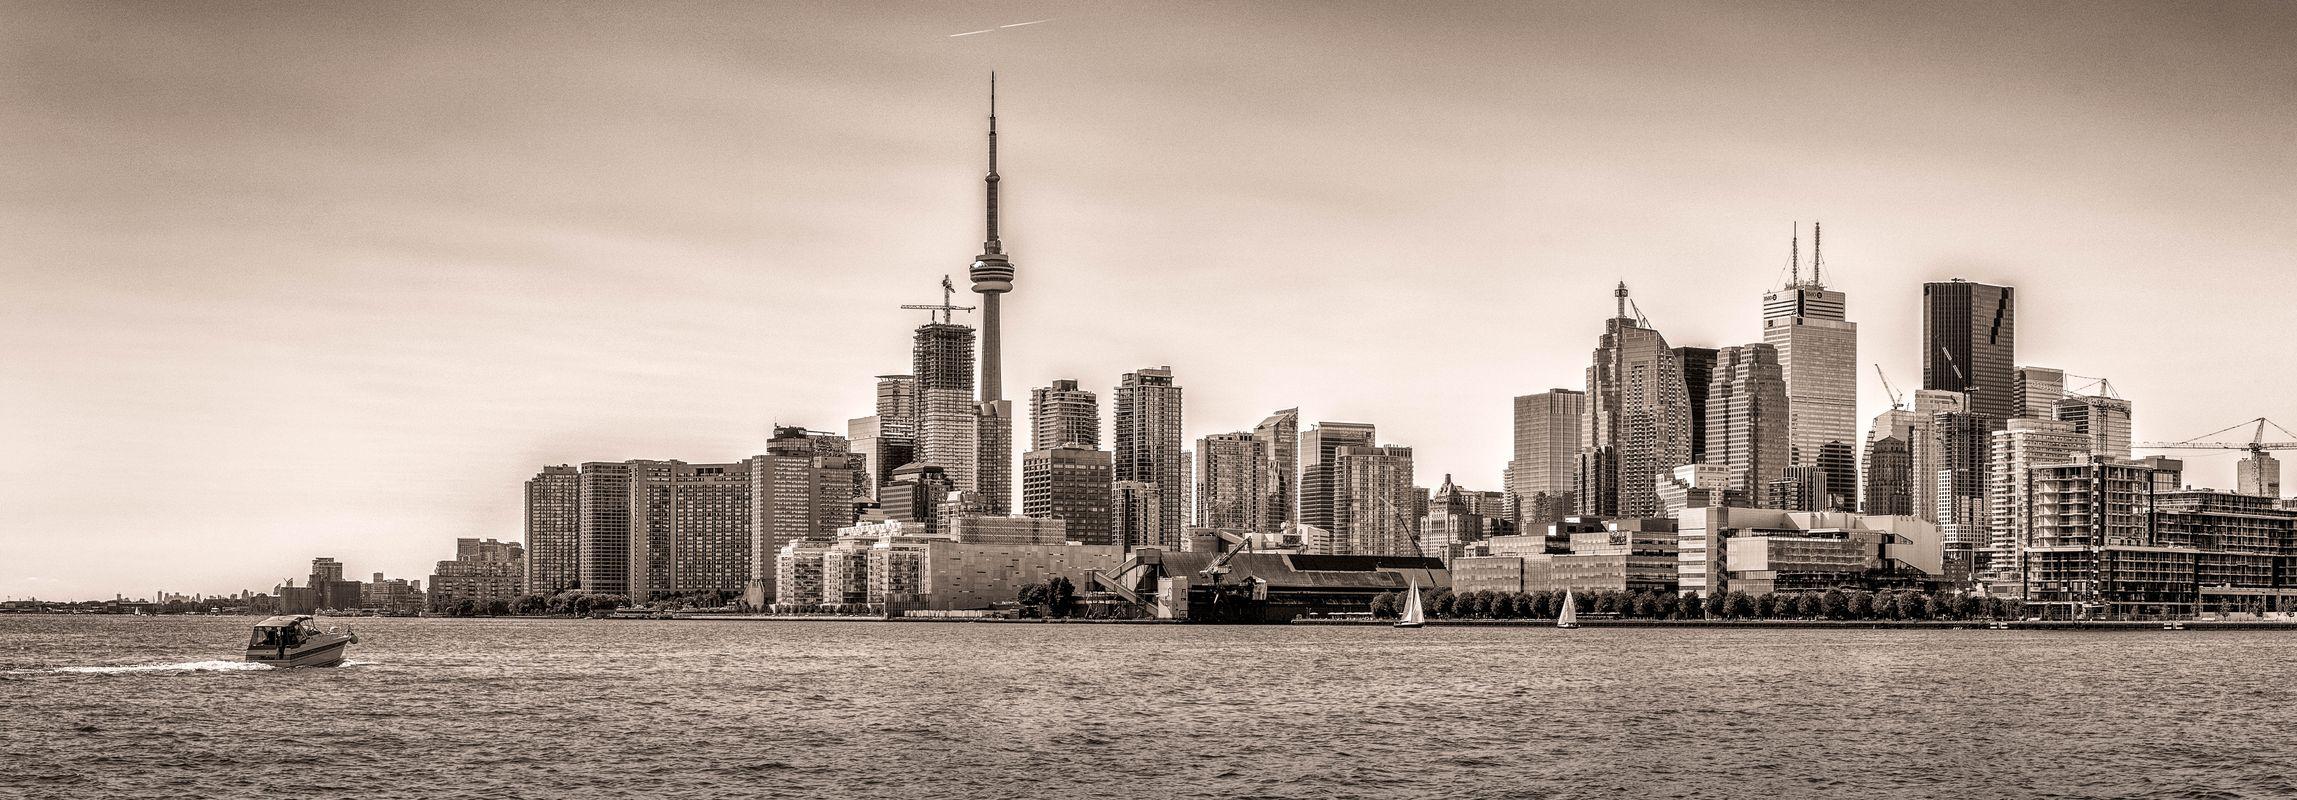 My Toronto (re-upload)